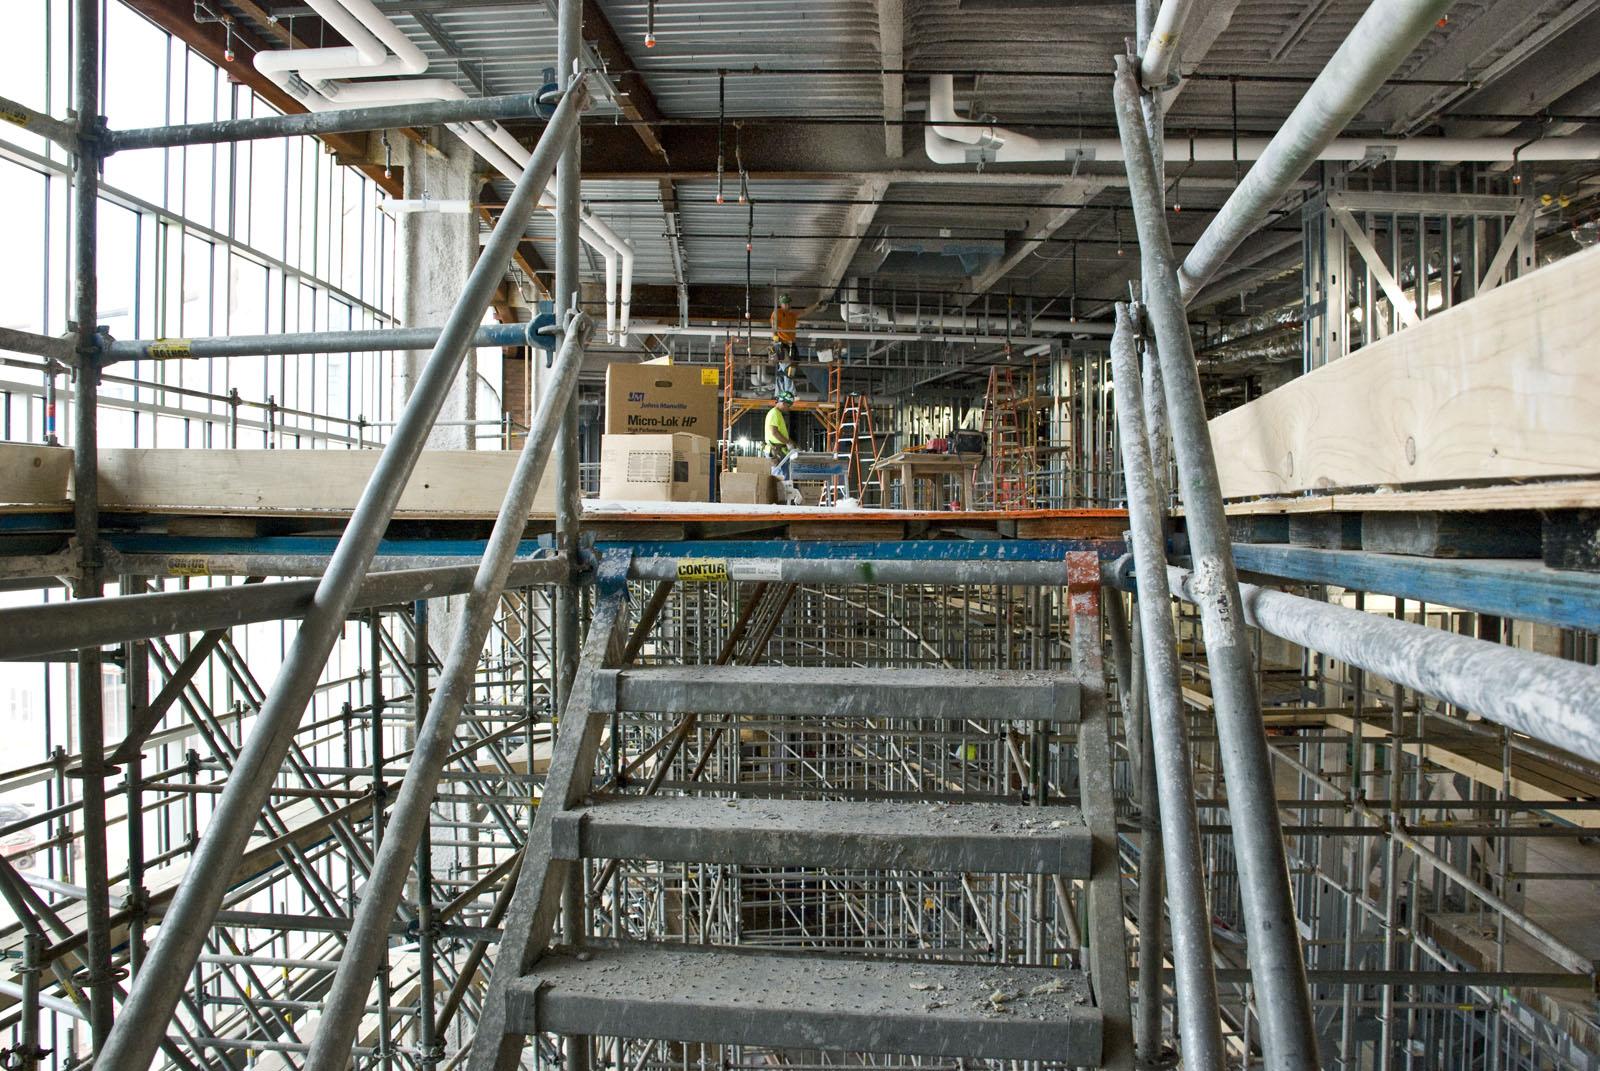 scaffold-rent-scaffolding-superior-scaffold-system-scaffold-atrium-hospital-nj-new-jersey-90